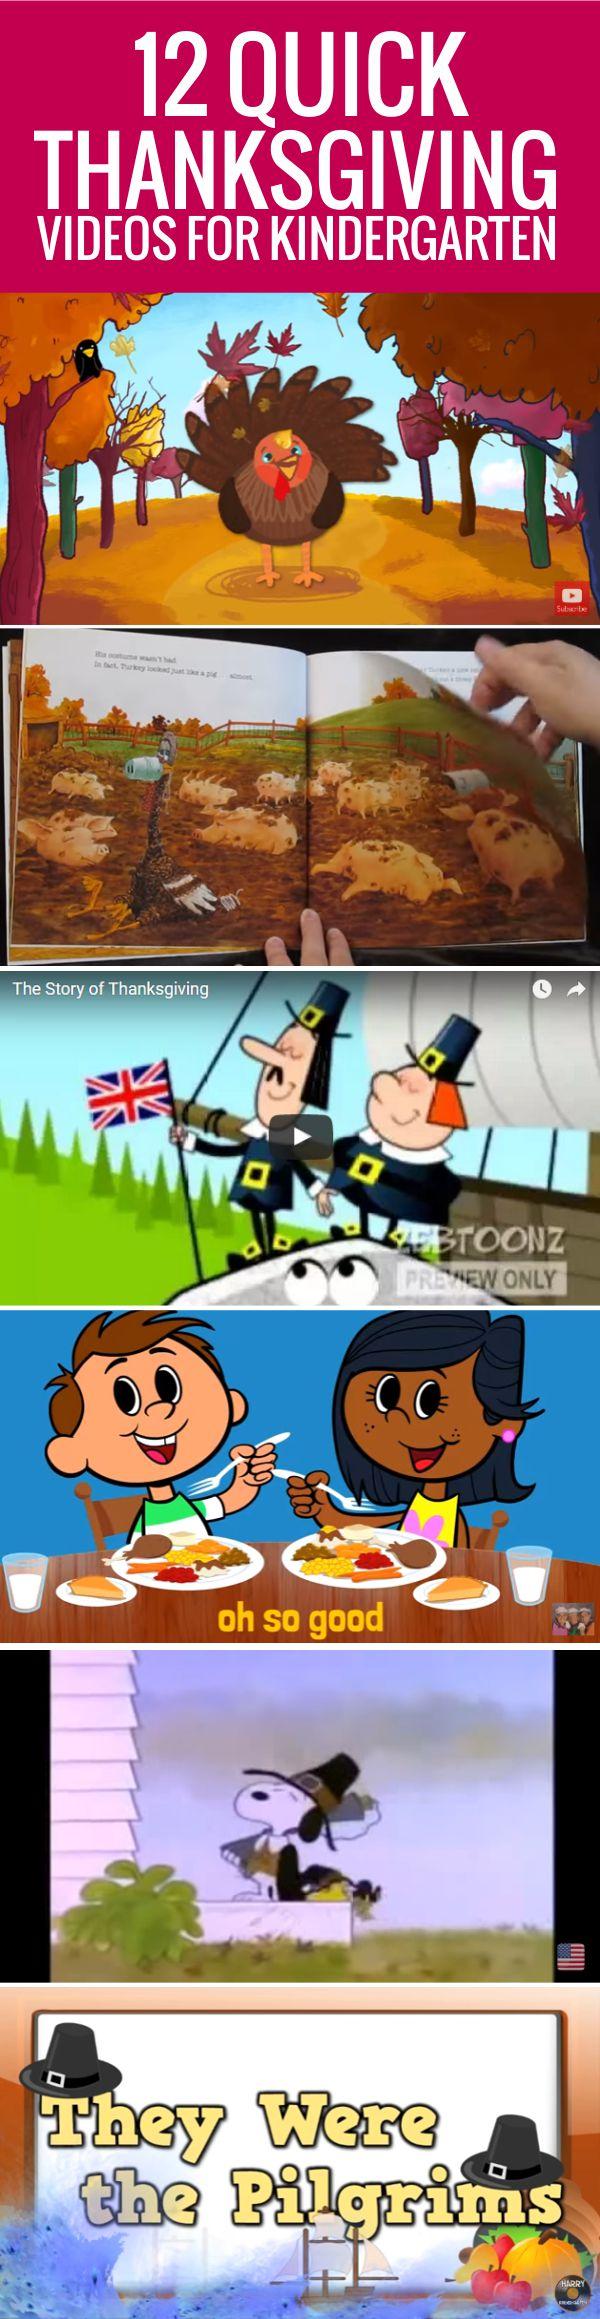 Quick Thanksgiving Videos for Kindergarten